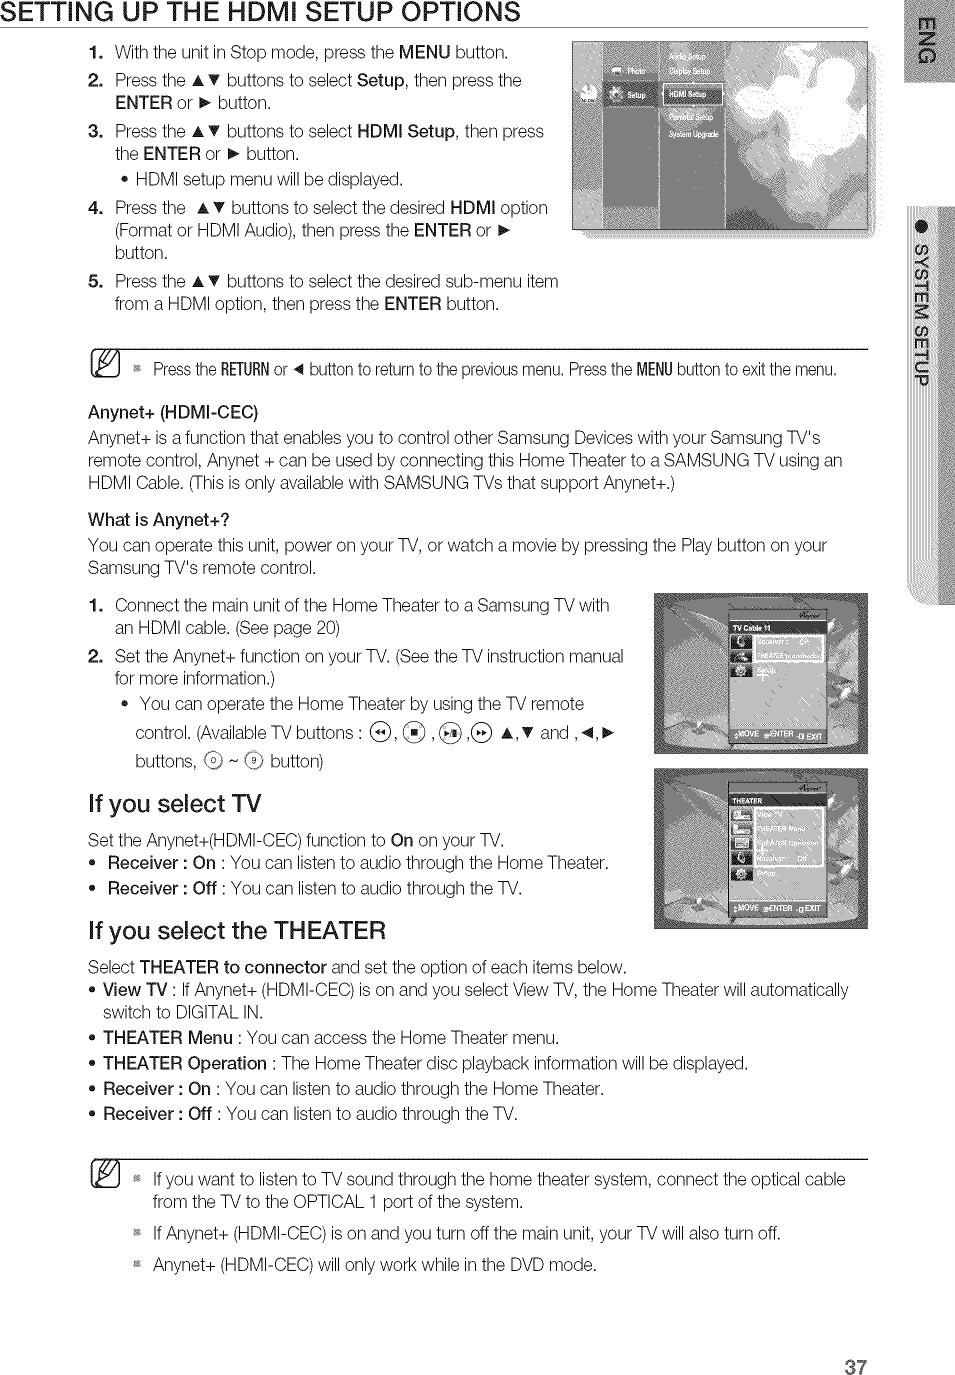 SAMSUNG DVD Systems Manual L0810277